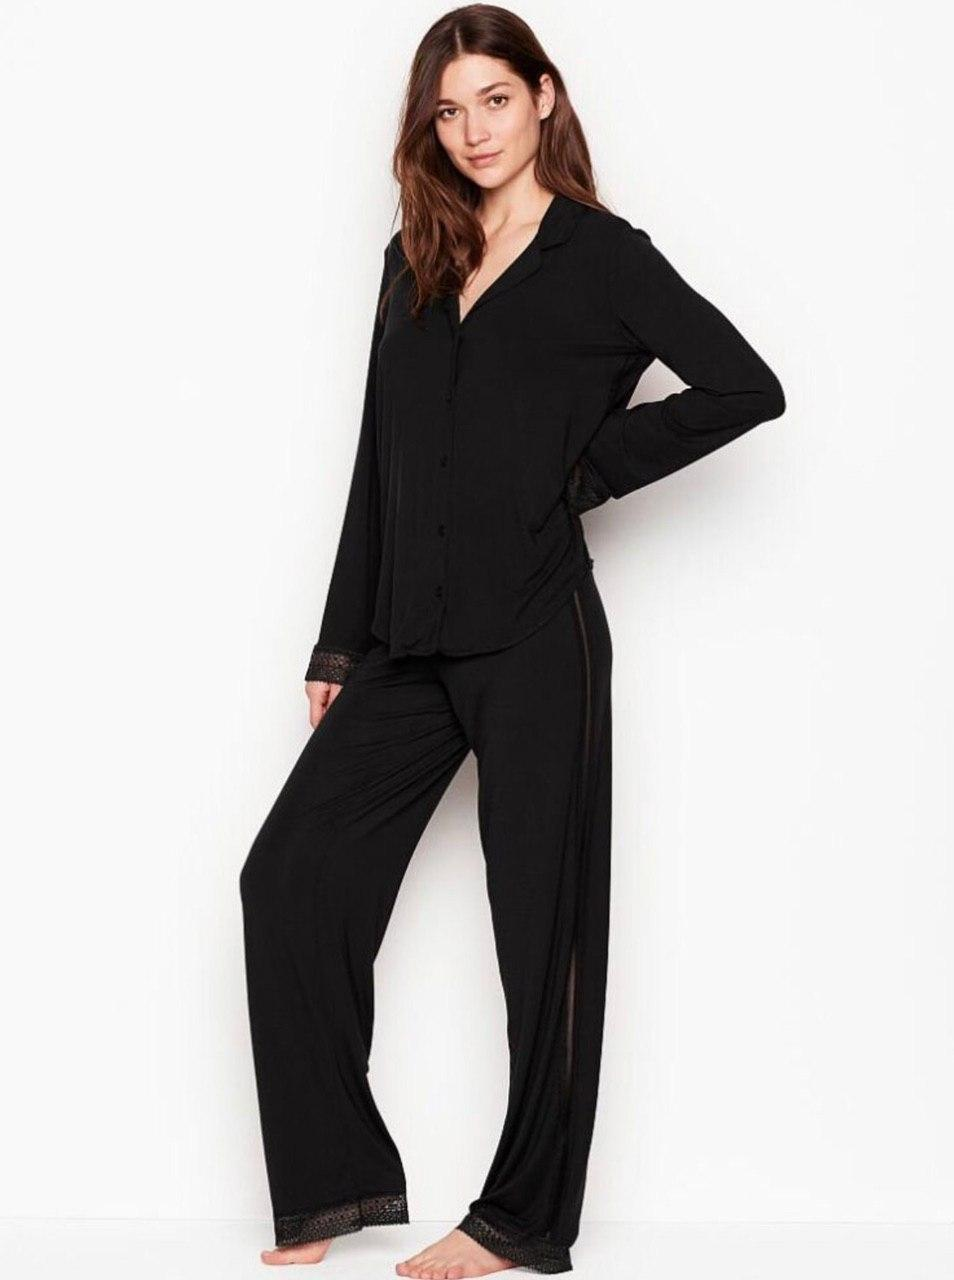 Трикотажная Пижама Victoria's Secret Supersoft Modal PJ Set, Разные цвета